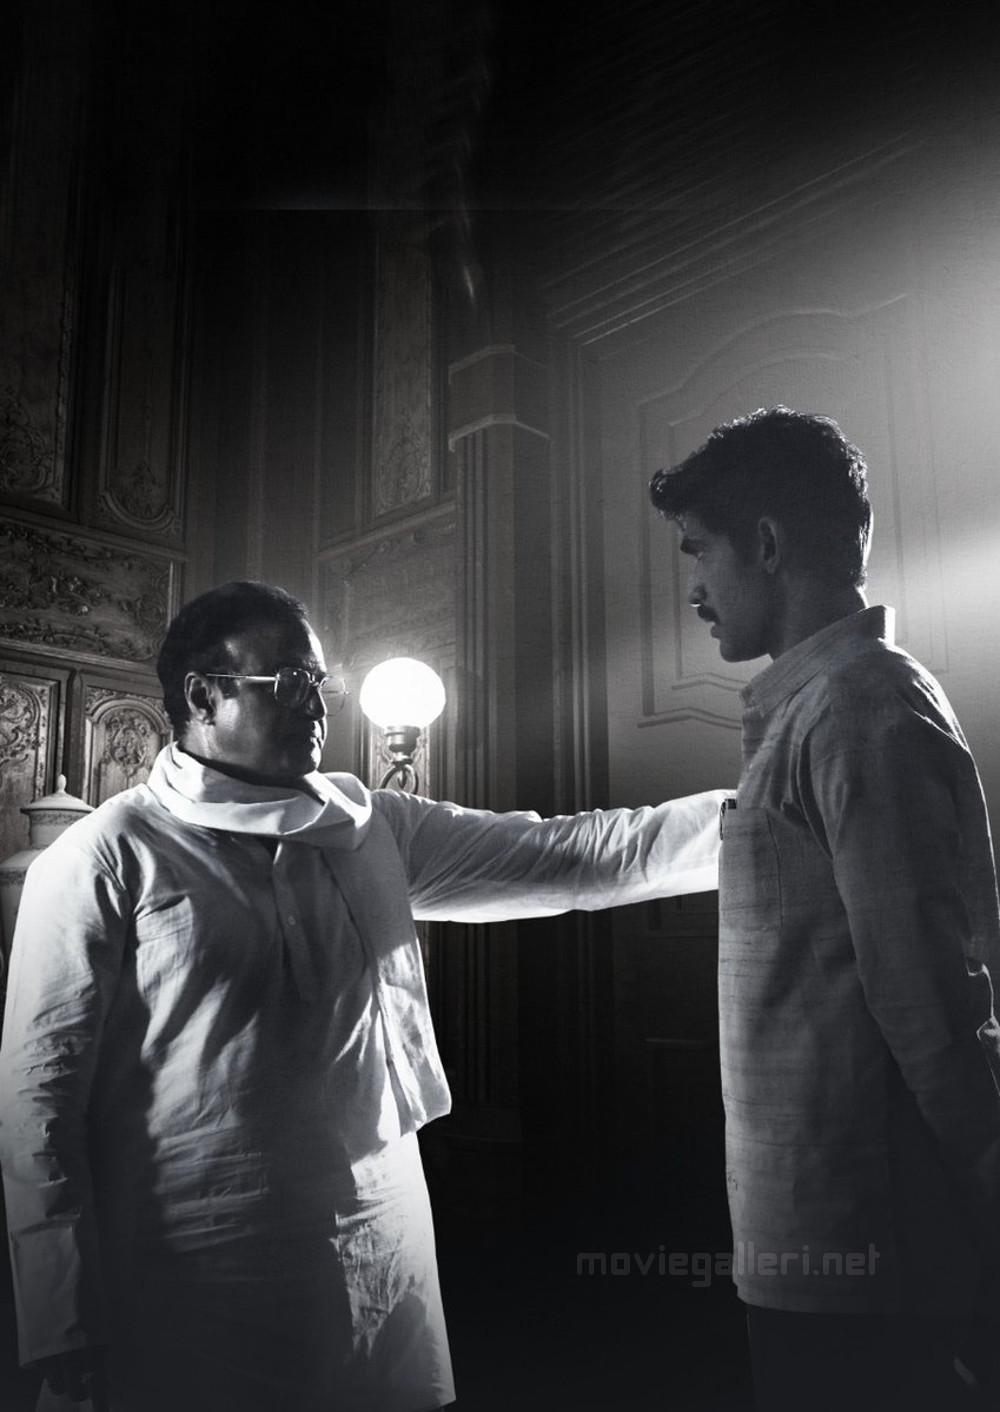 Actor Nandamuri Balakrishna as NTR and Rana Daggubati as Nara Chandrababu Naidu from NTR Biopic Movie